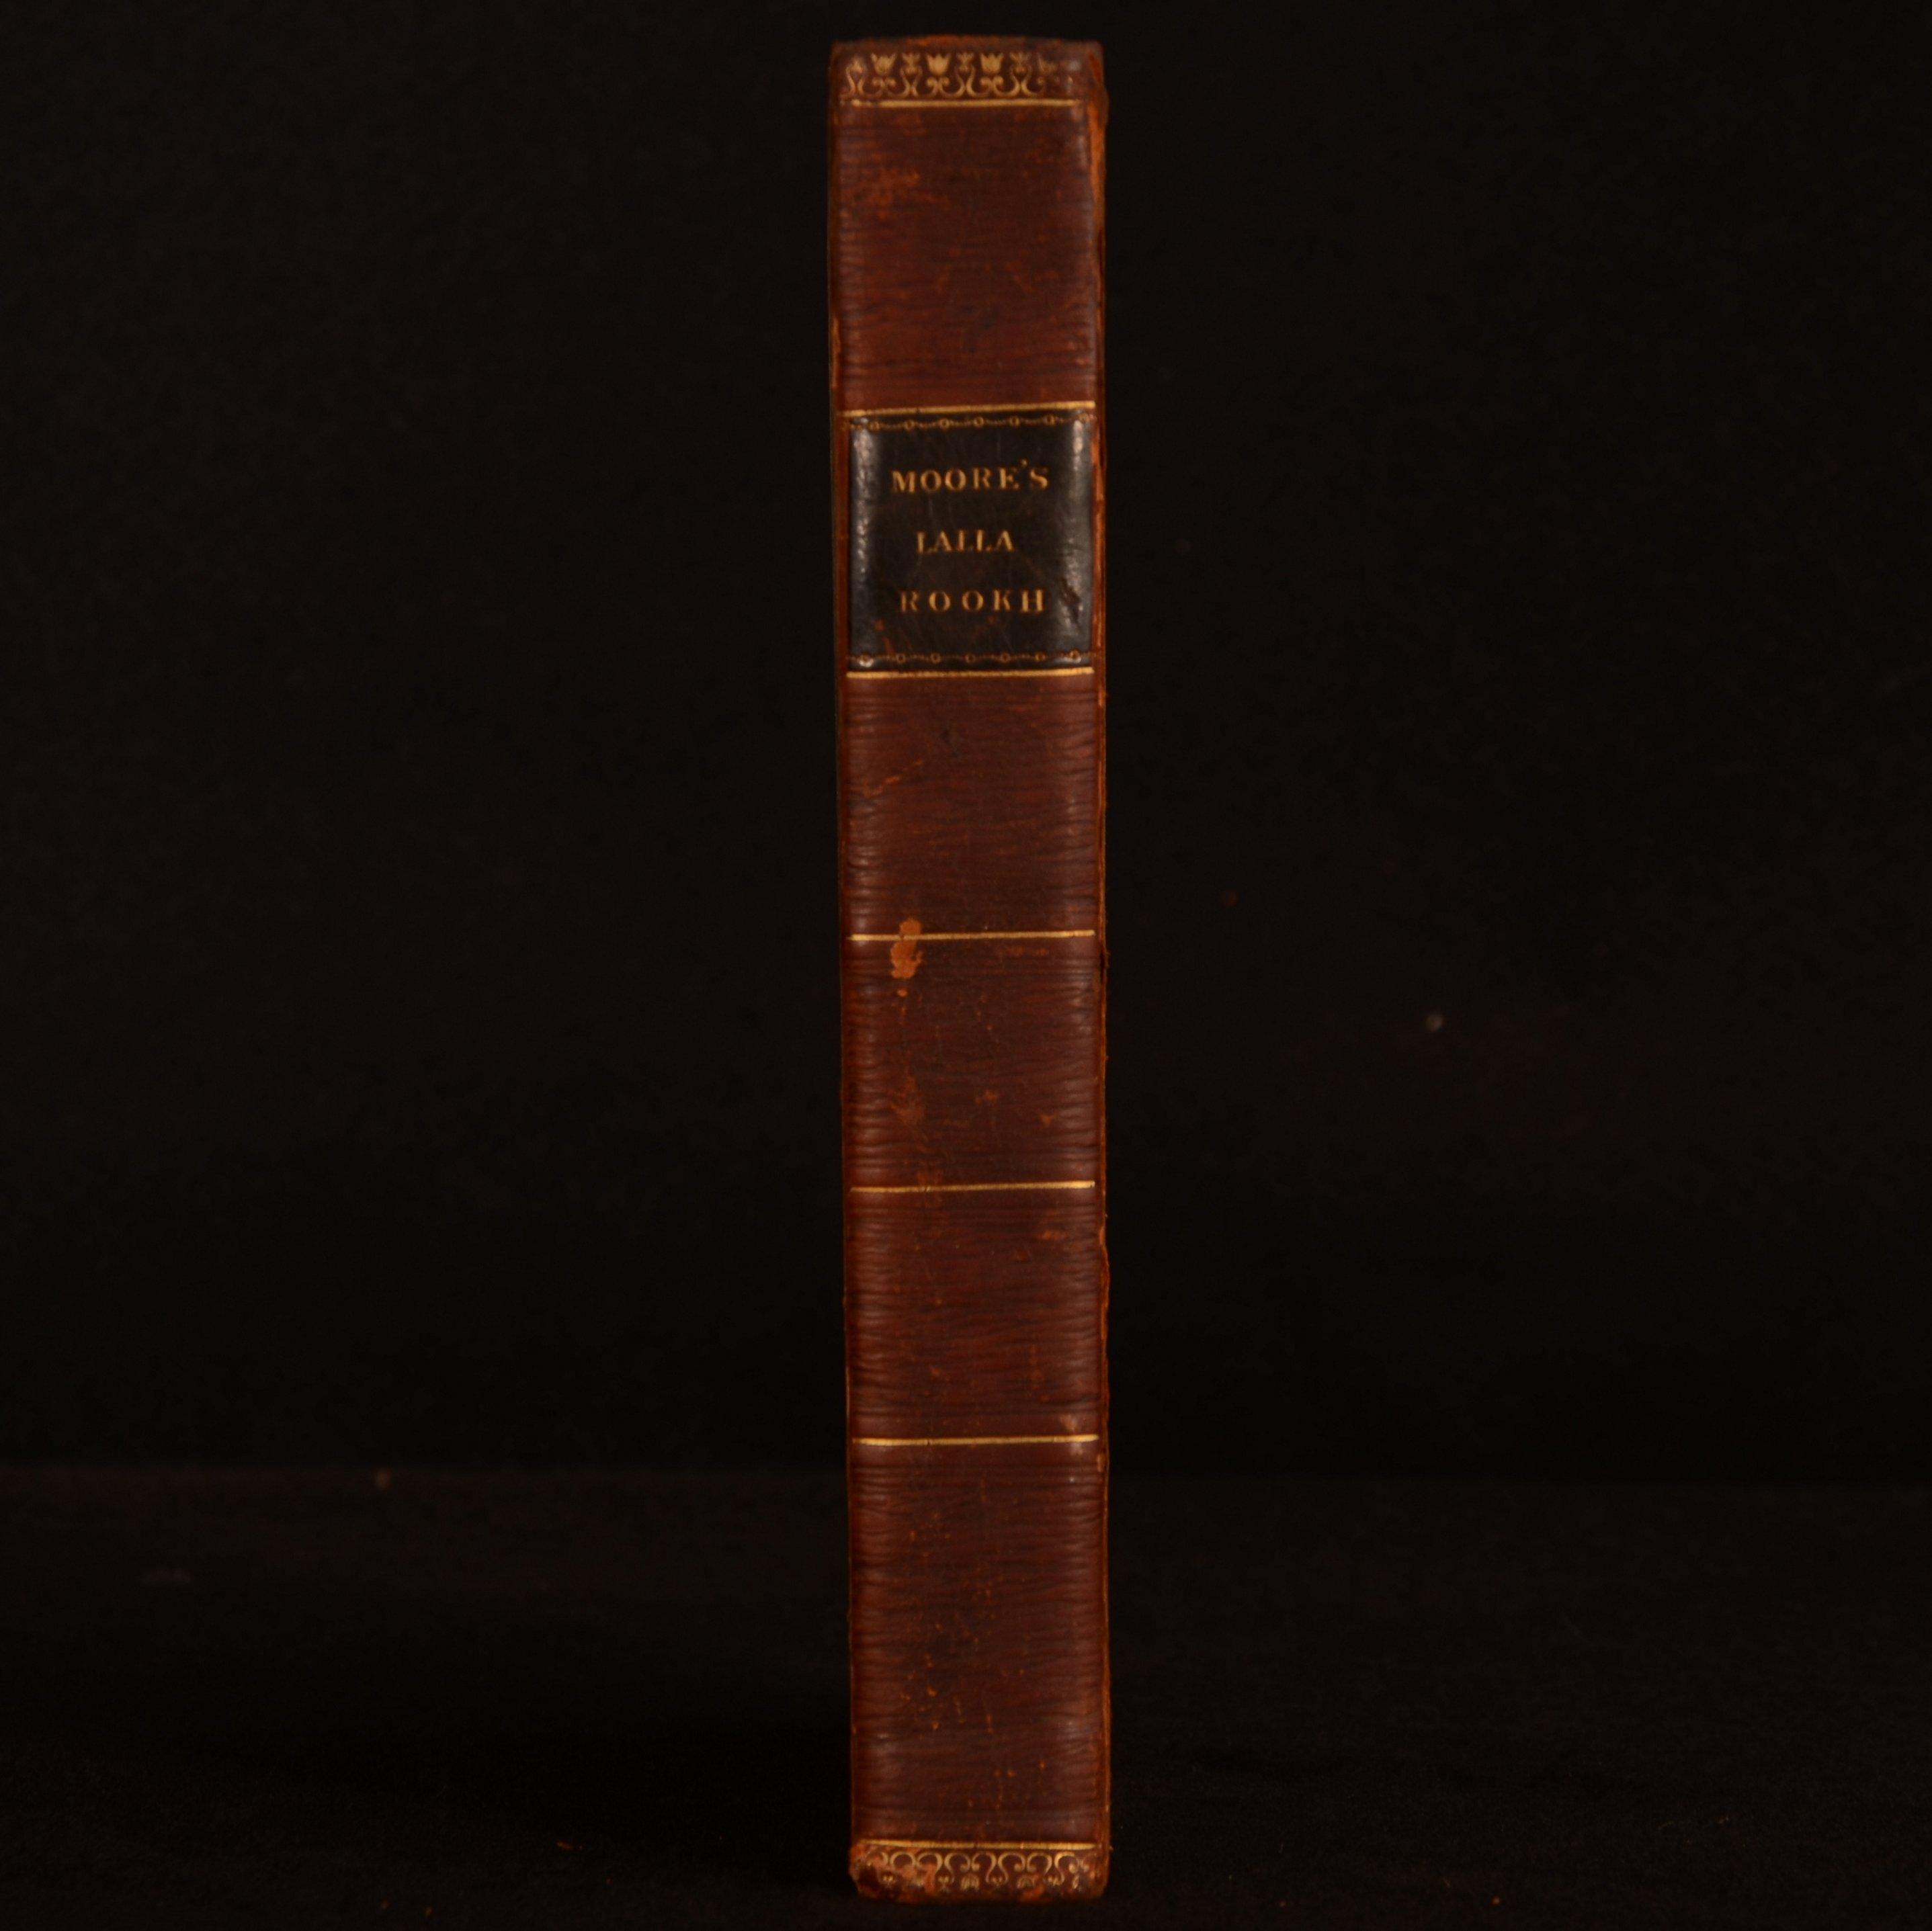 1817 Lalla Rookh An Oriental Romance Thomas Moore Third